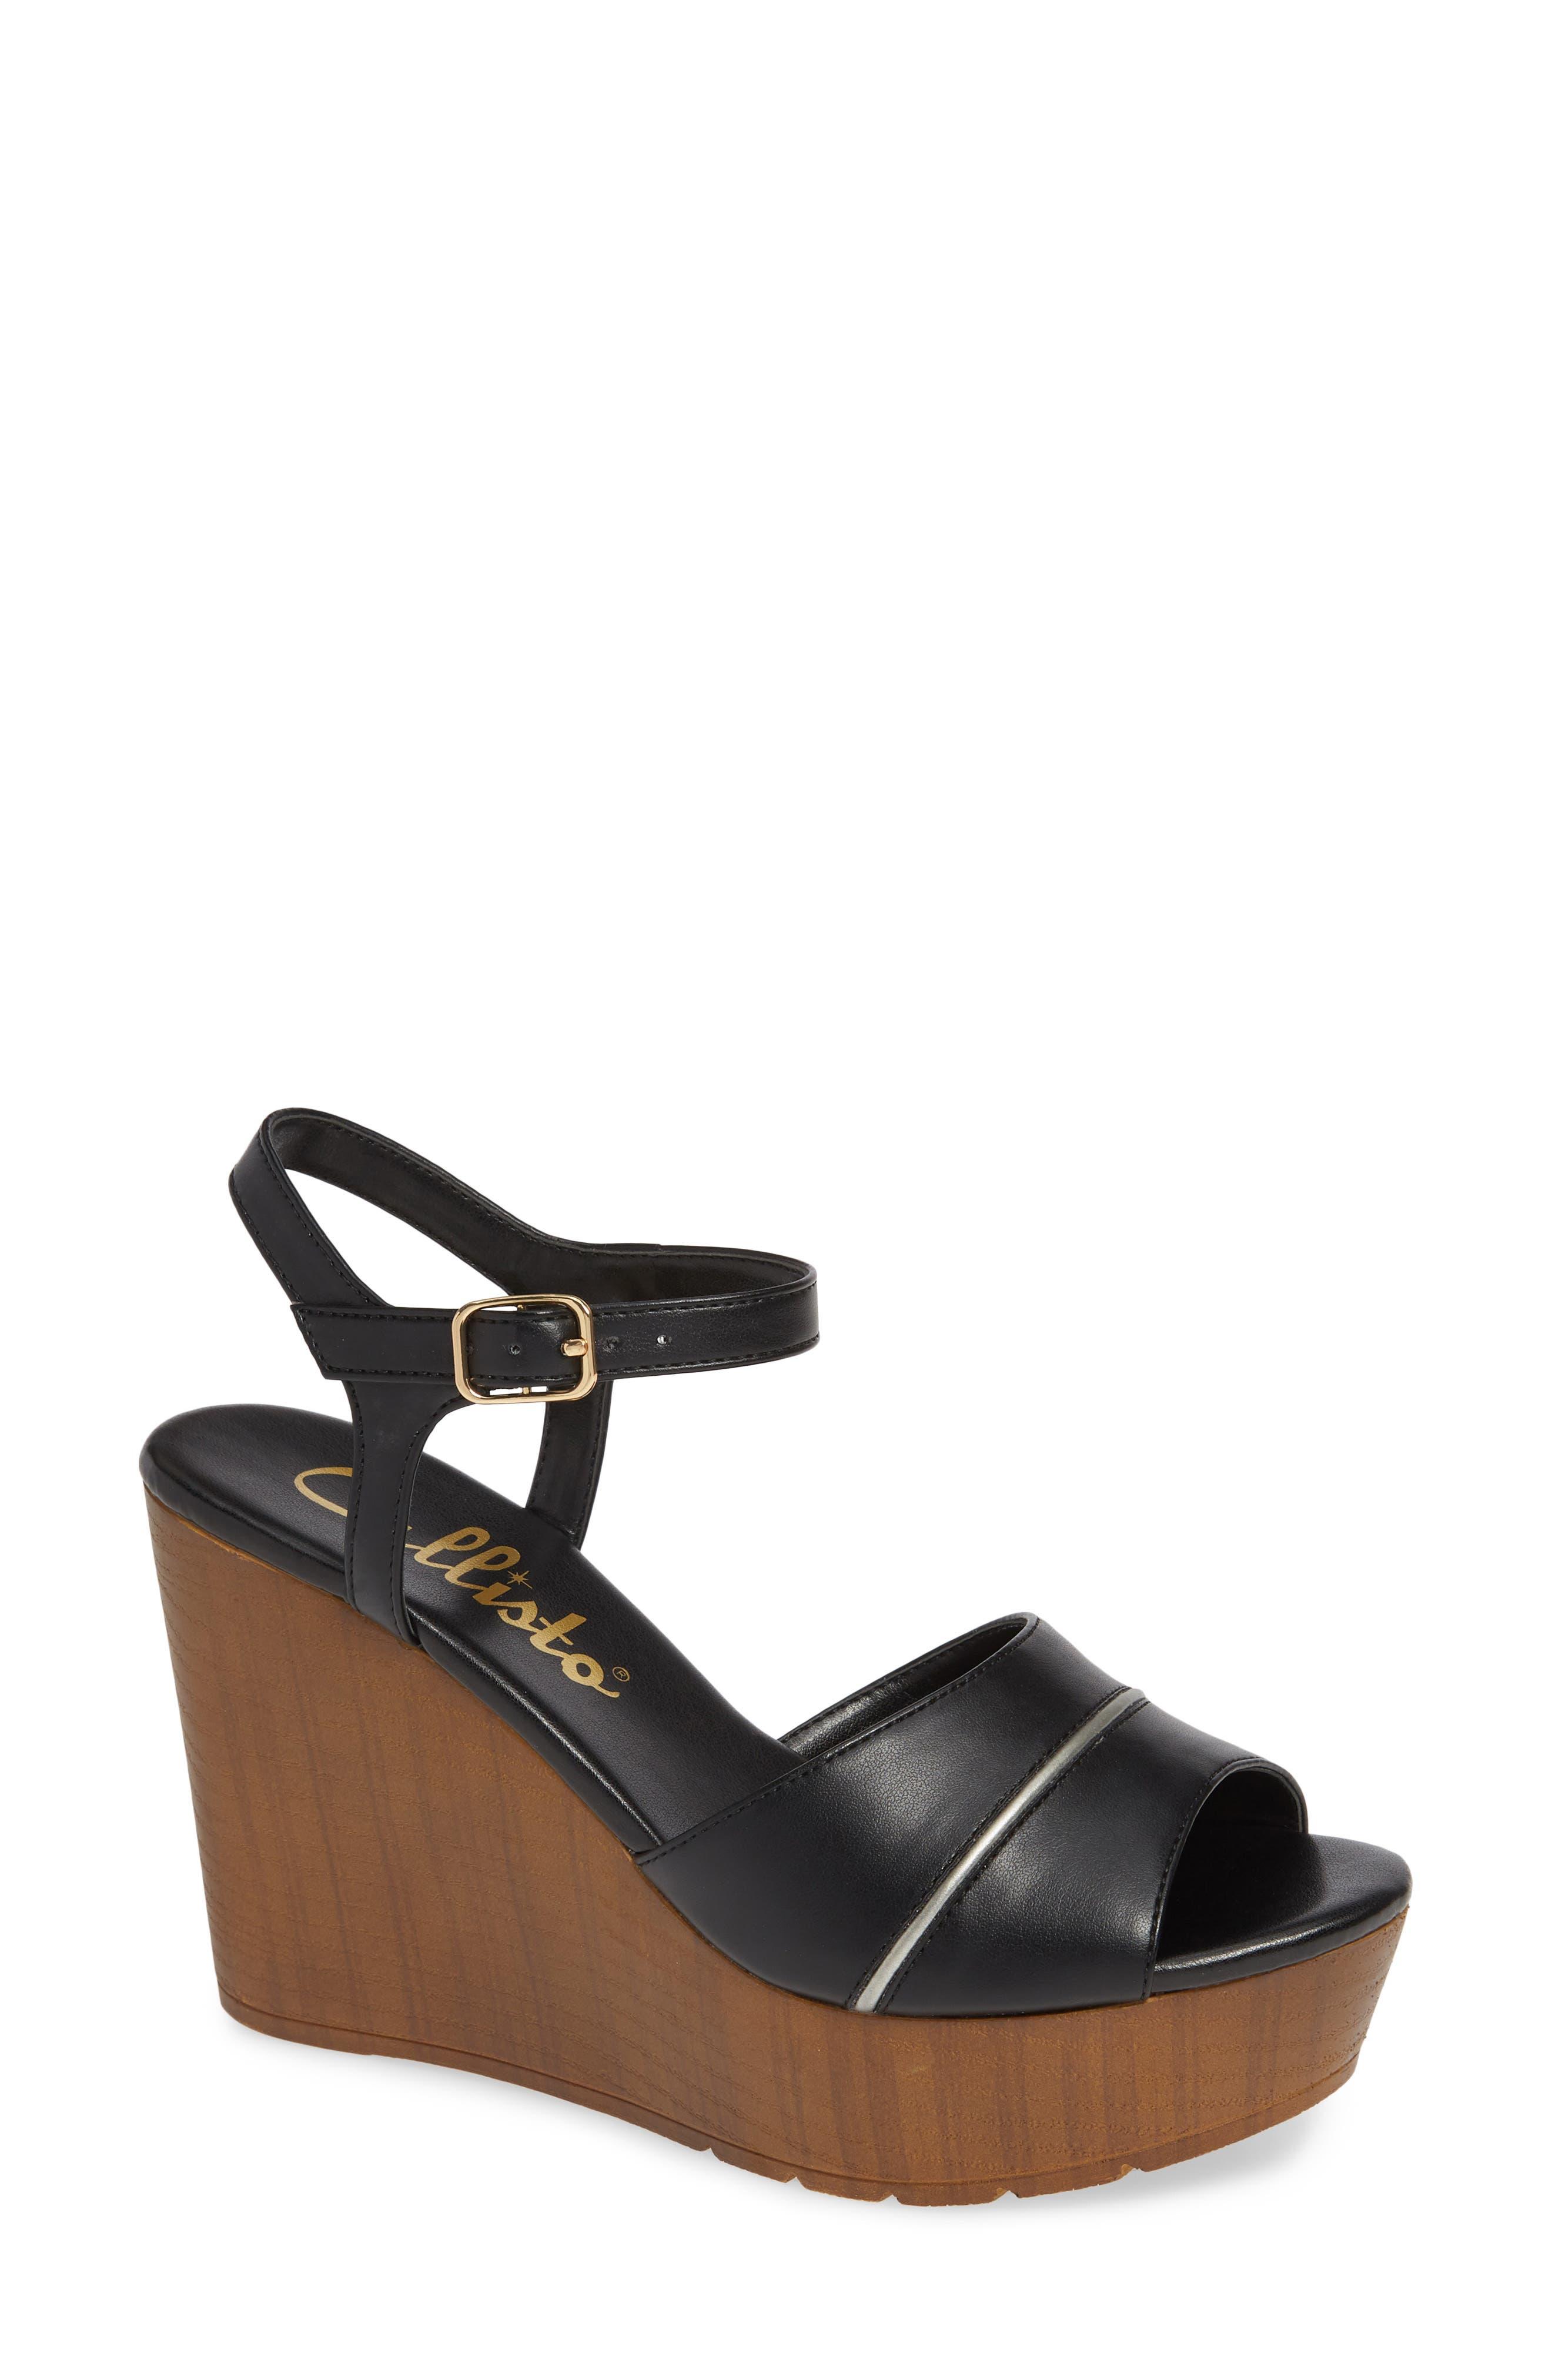 CALLISTO Masalla Platform Wedge Sandal, Main, color, BLACK FAUX LEATHER